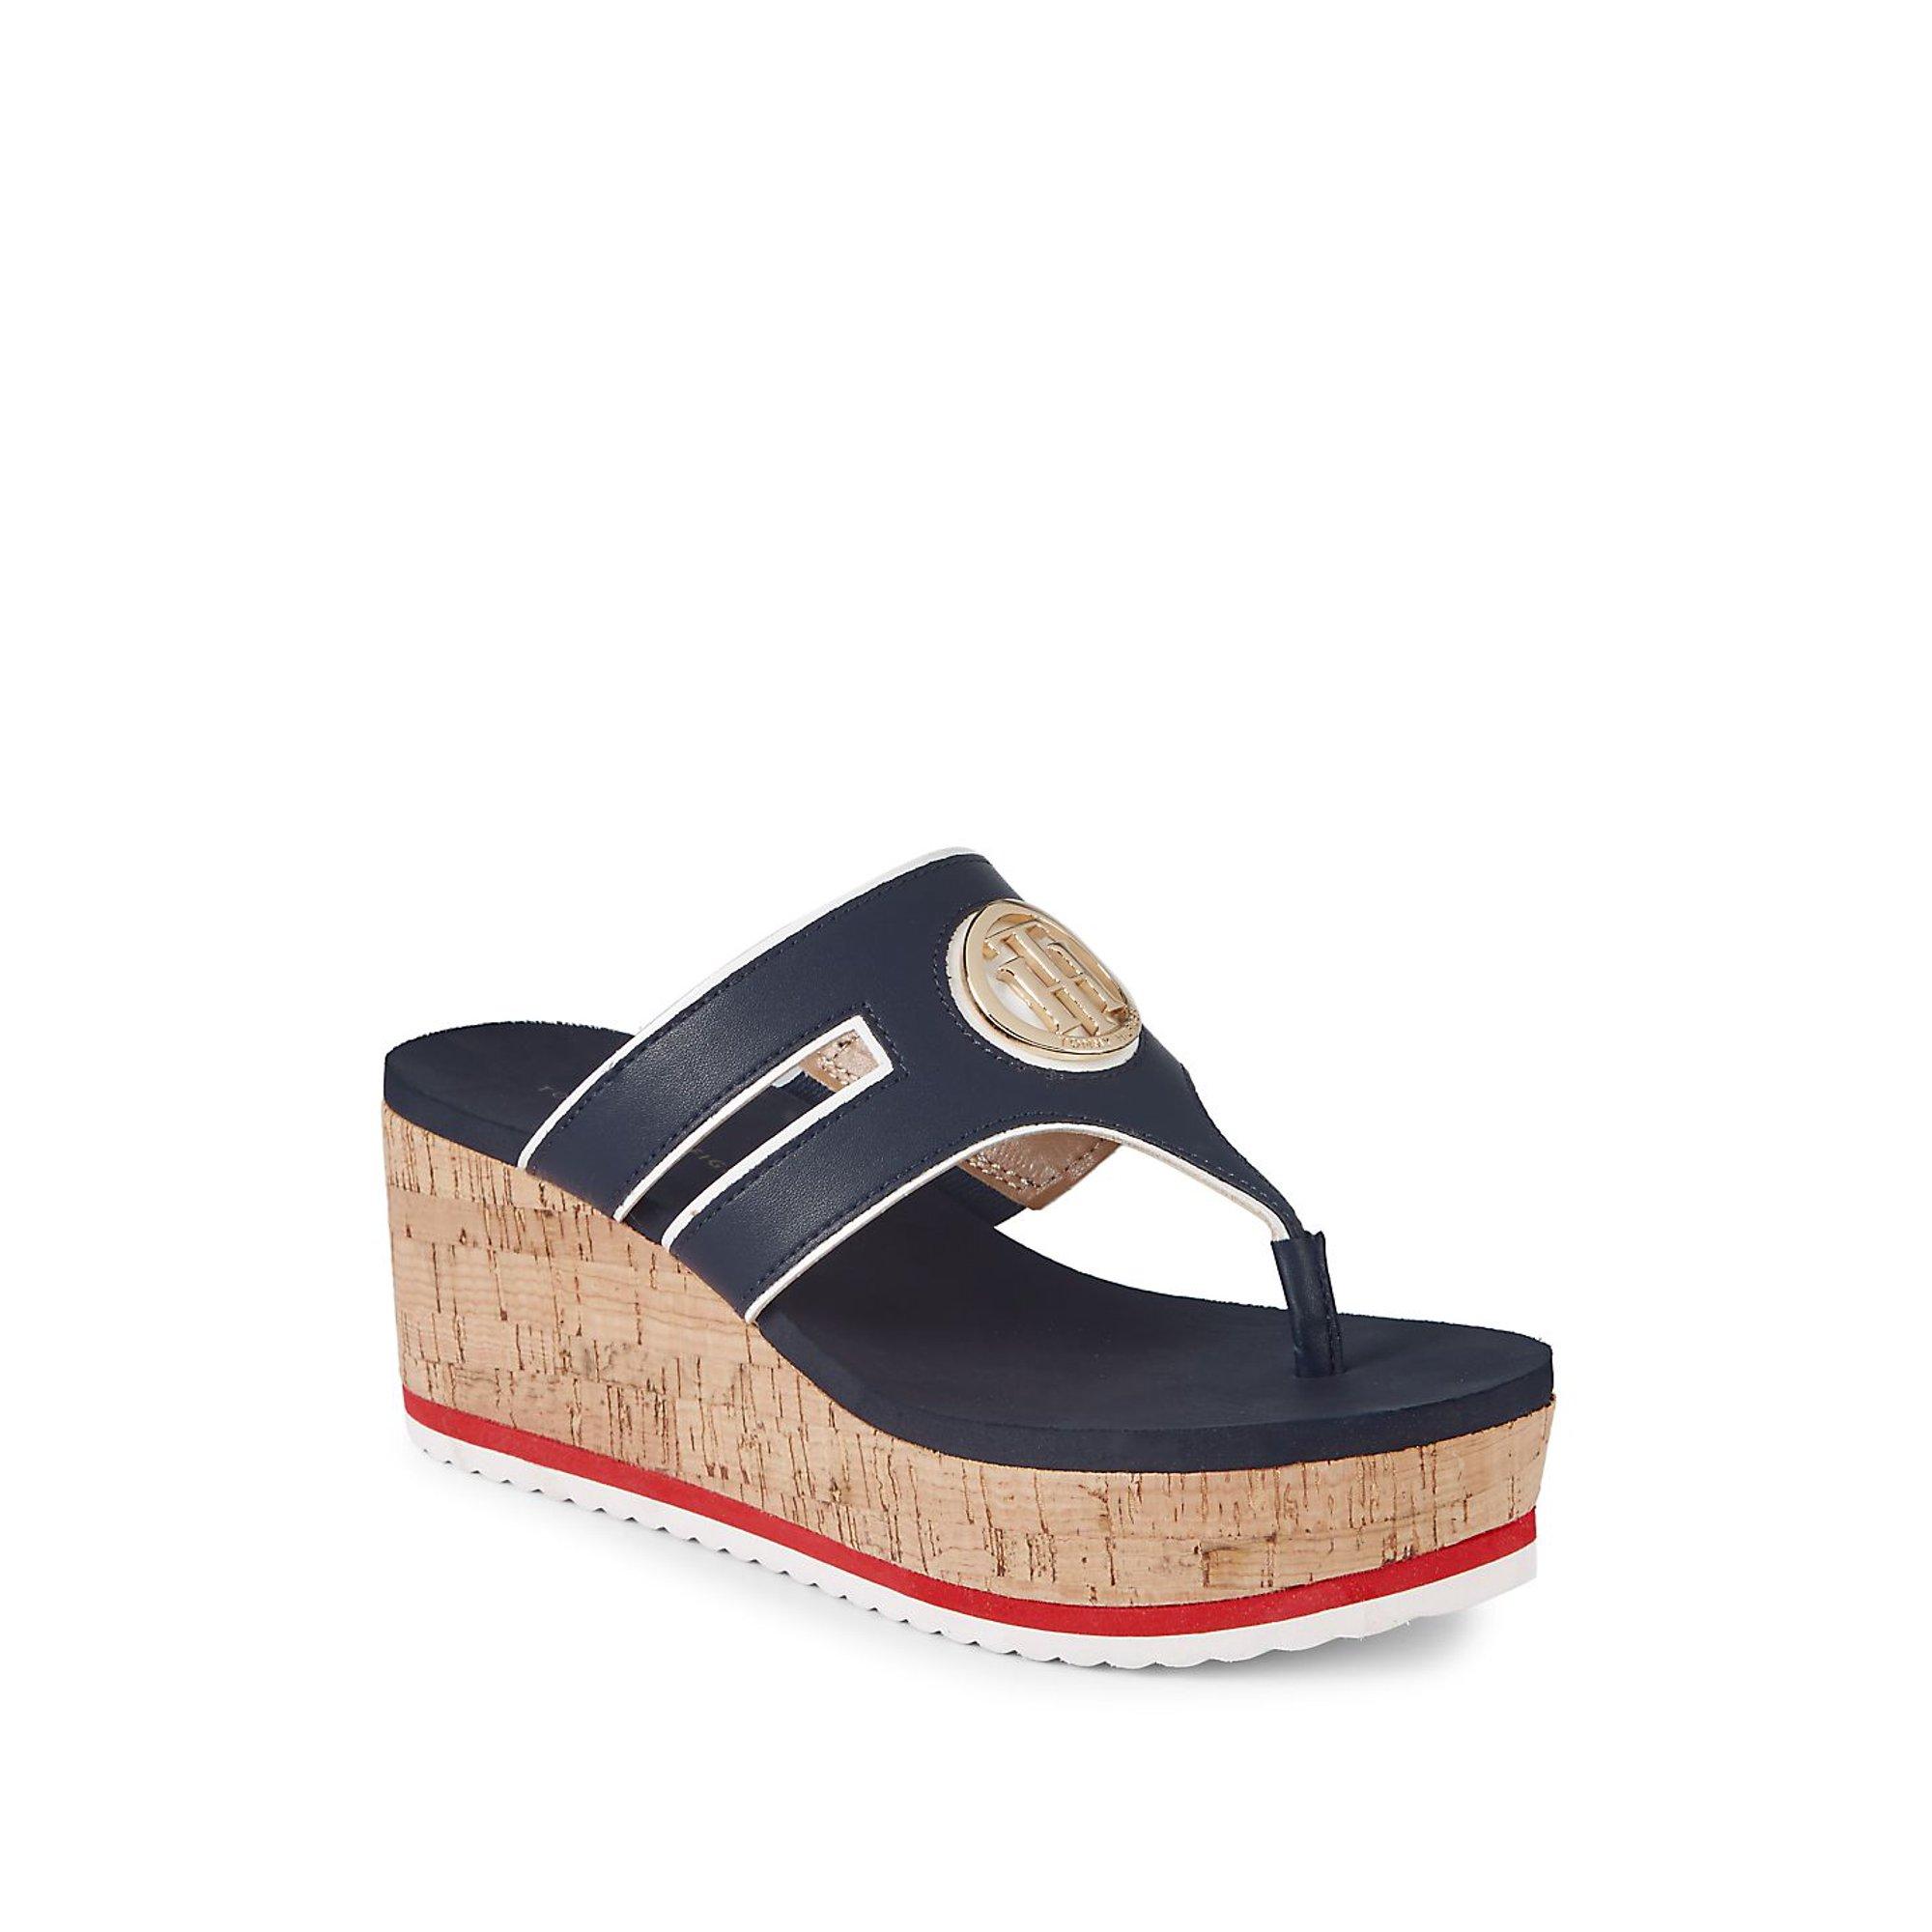 3c9708925629 Buy Galley Cork Platform Wedge Sandals